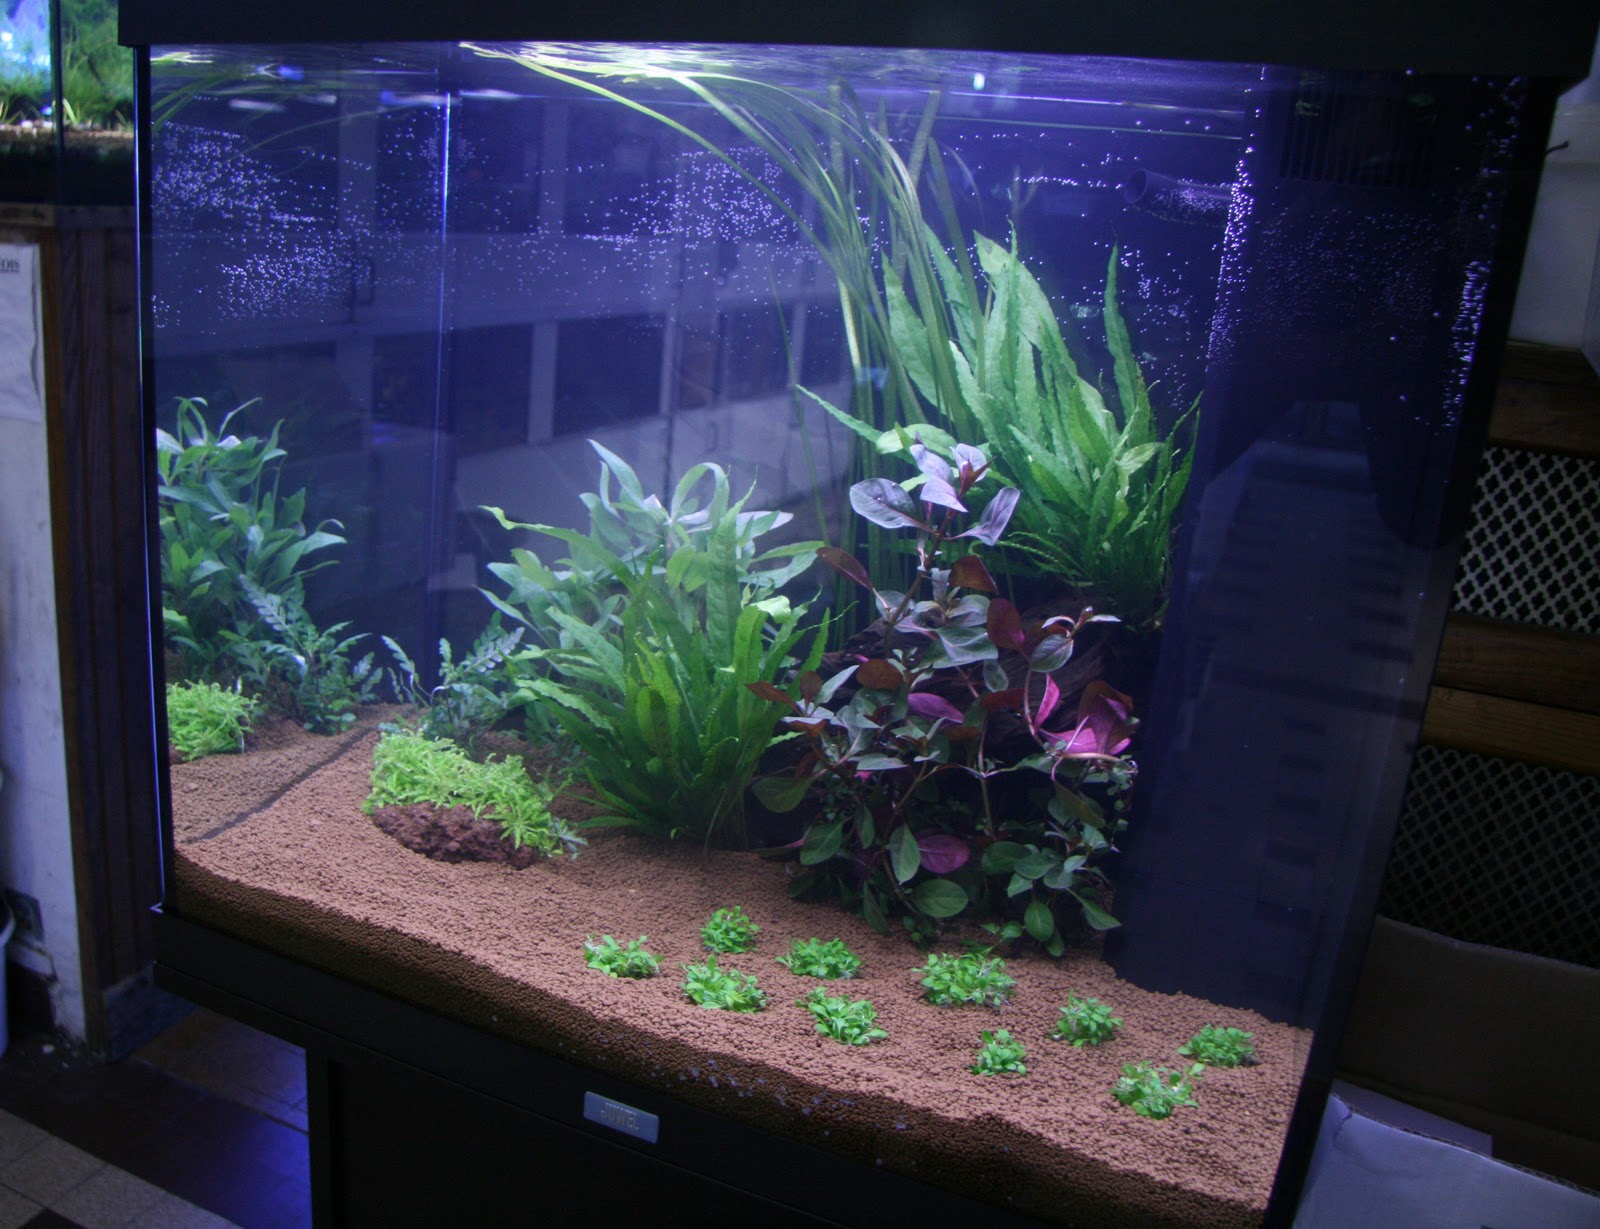 Fishroom Benjy-Sub: Aquascape pour debutant